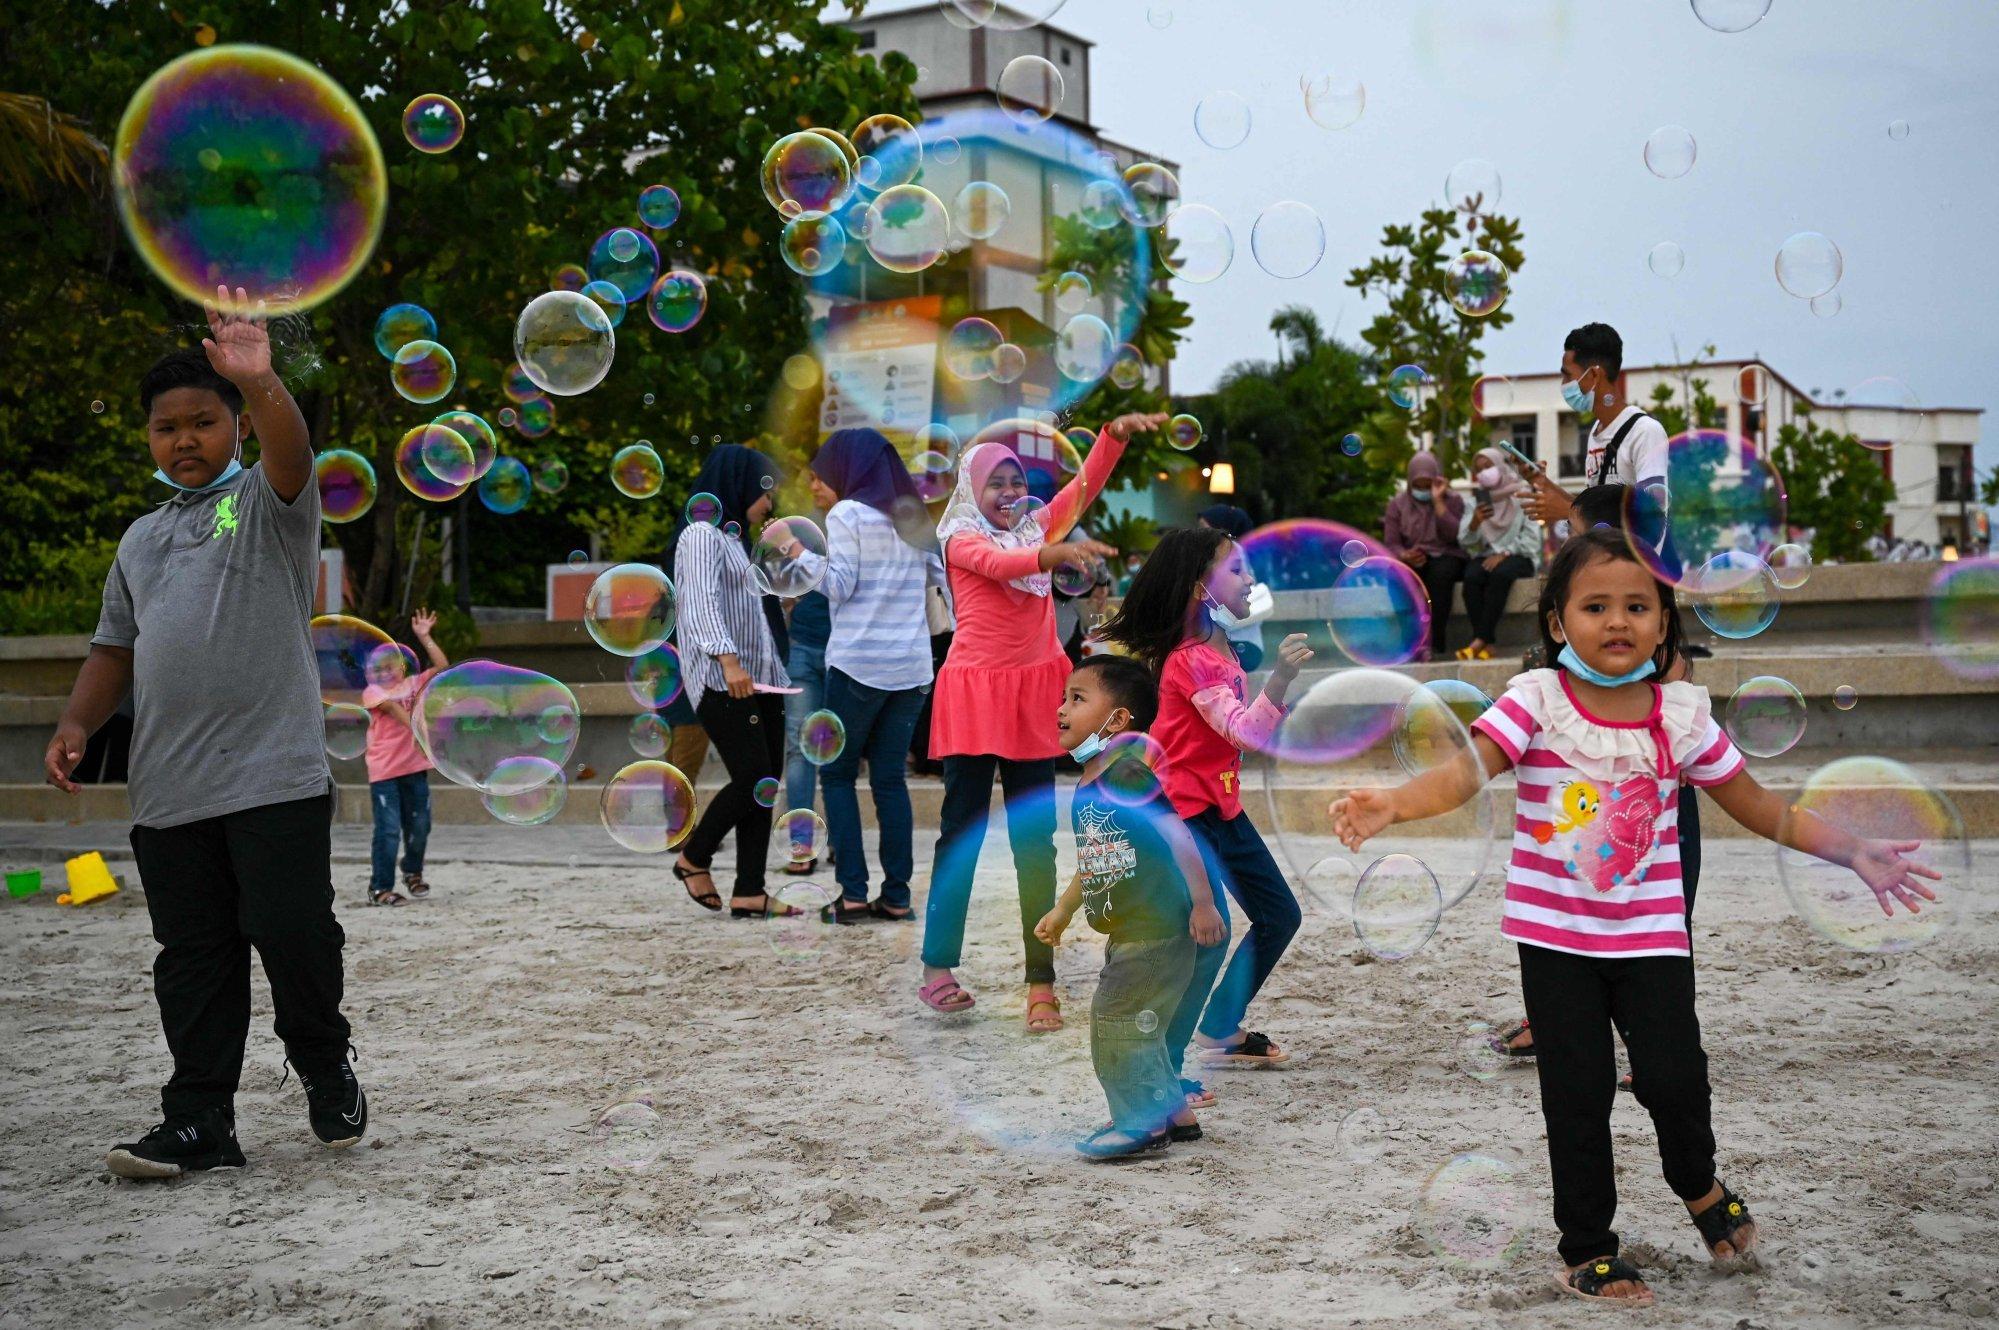 Children play with bubbles at Pantai Cenang in Langkawi. Photo: AFP